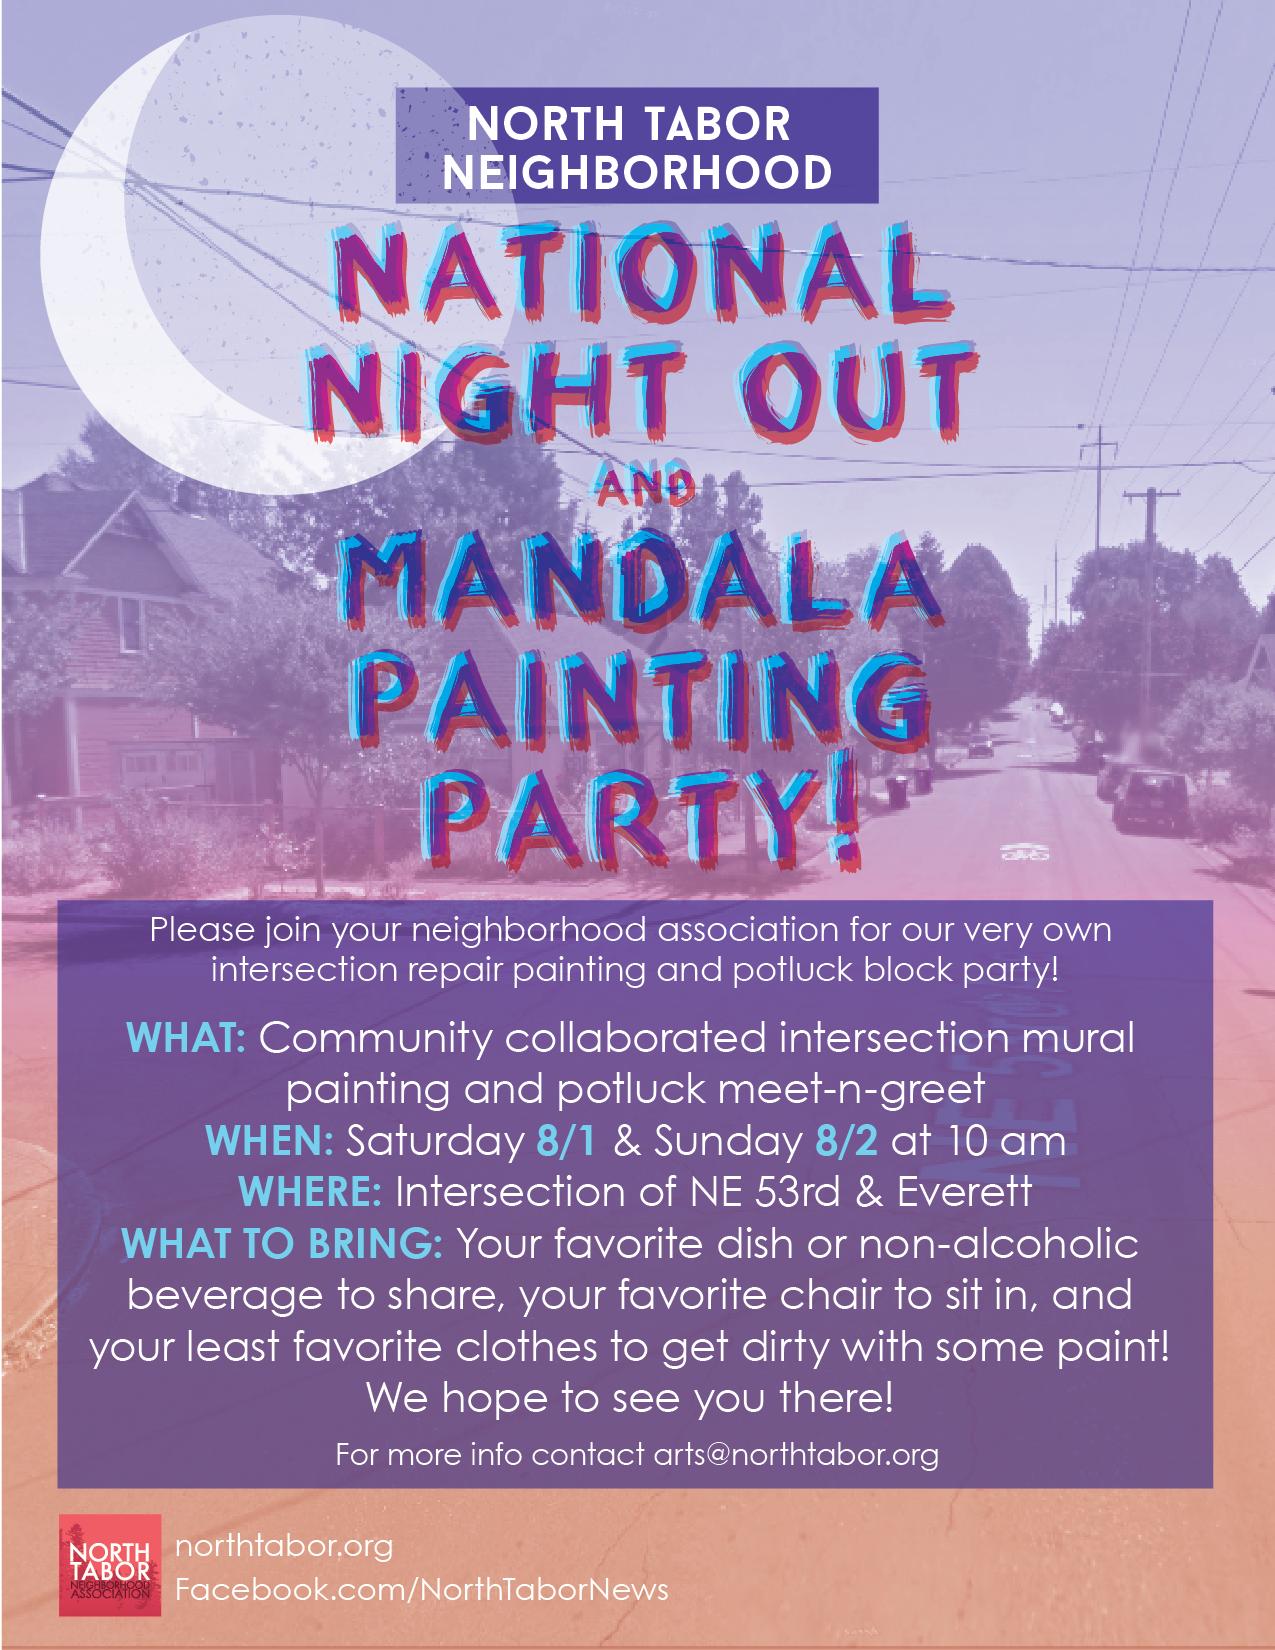 Mandala Painting and Neighborhood Party!